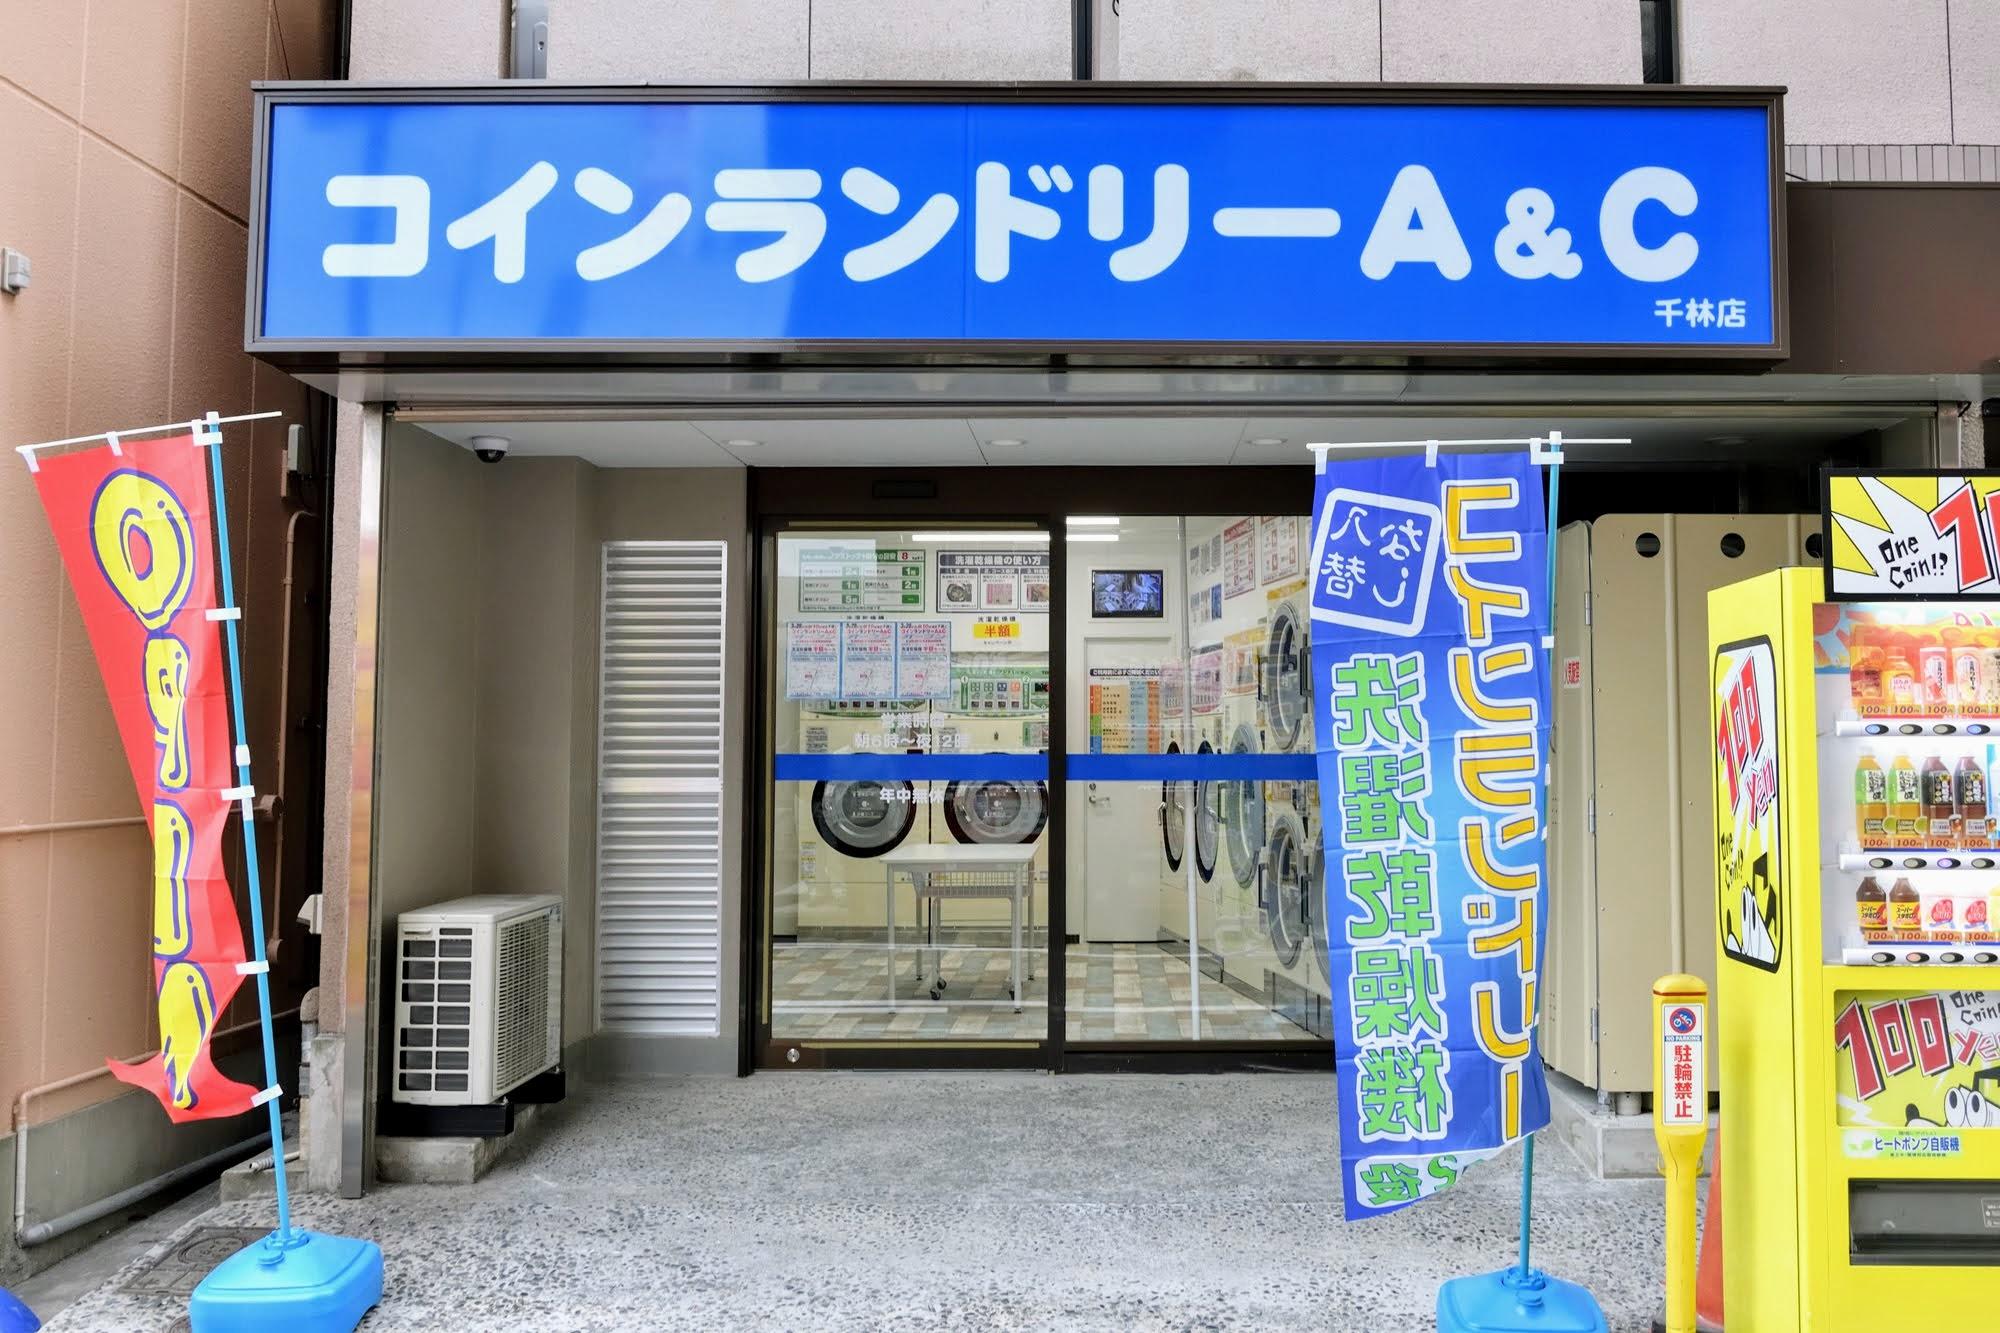 COIN LAUNDRY A&C - senbayashi 画像5